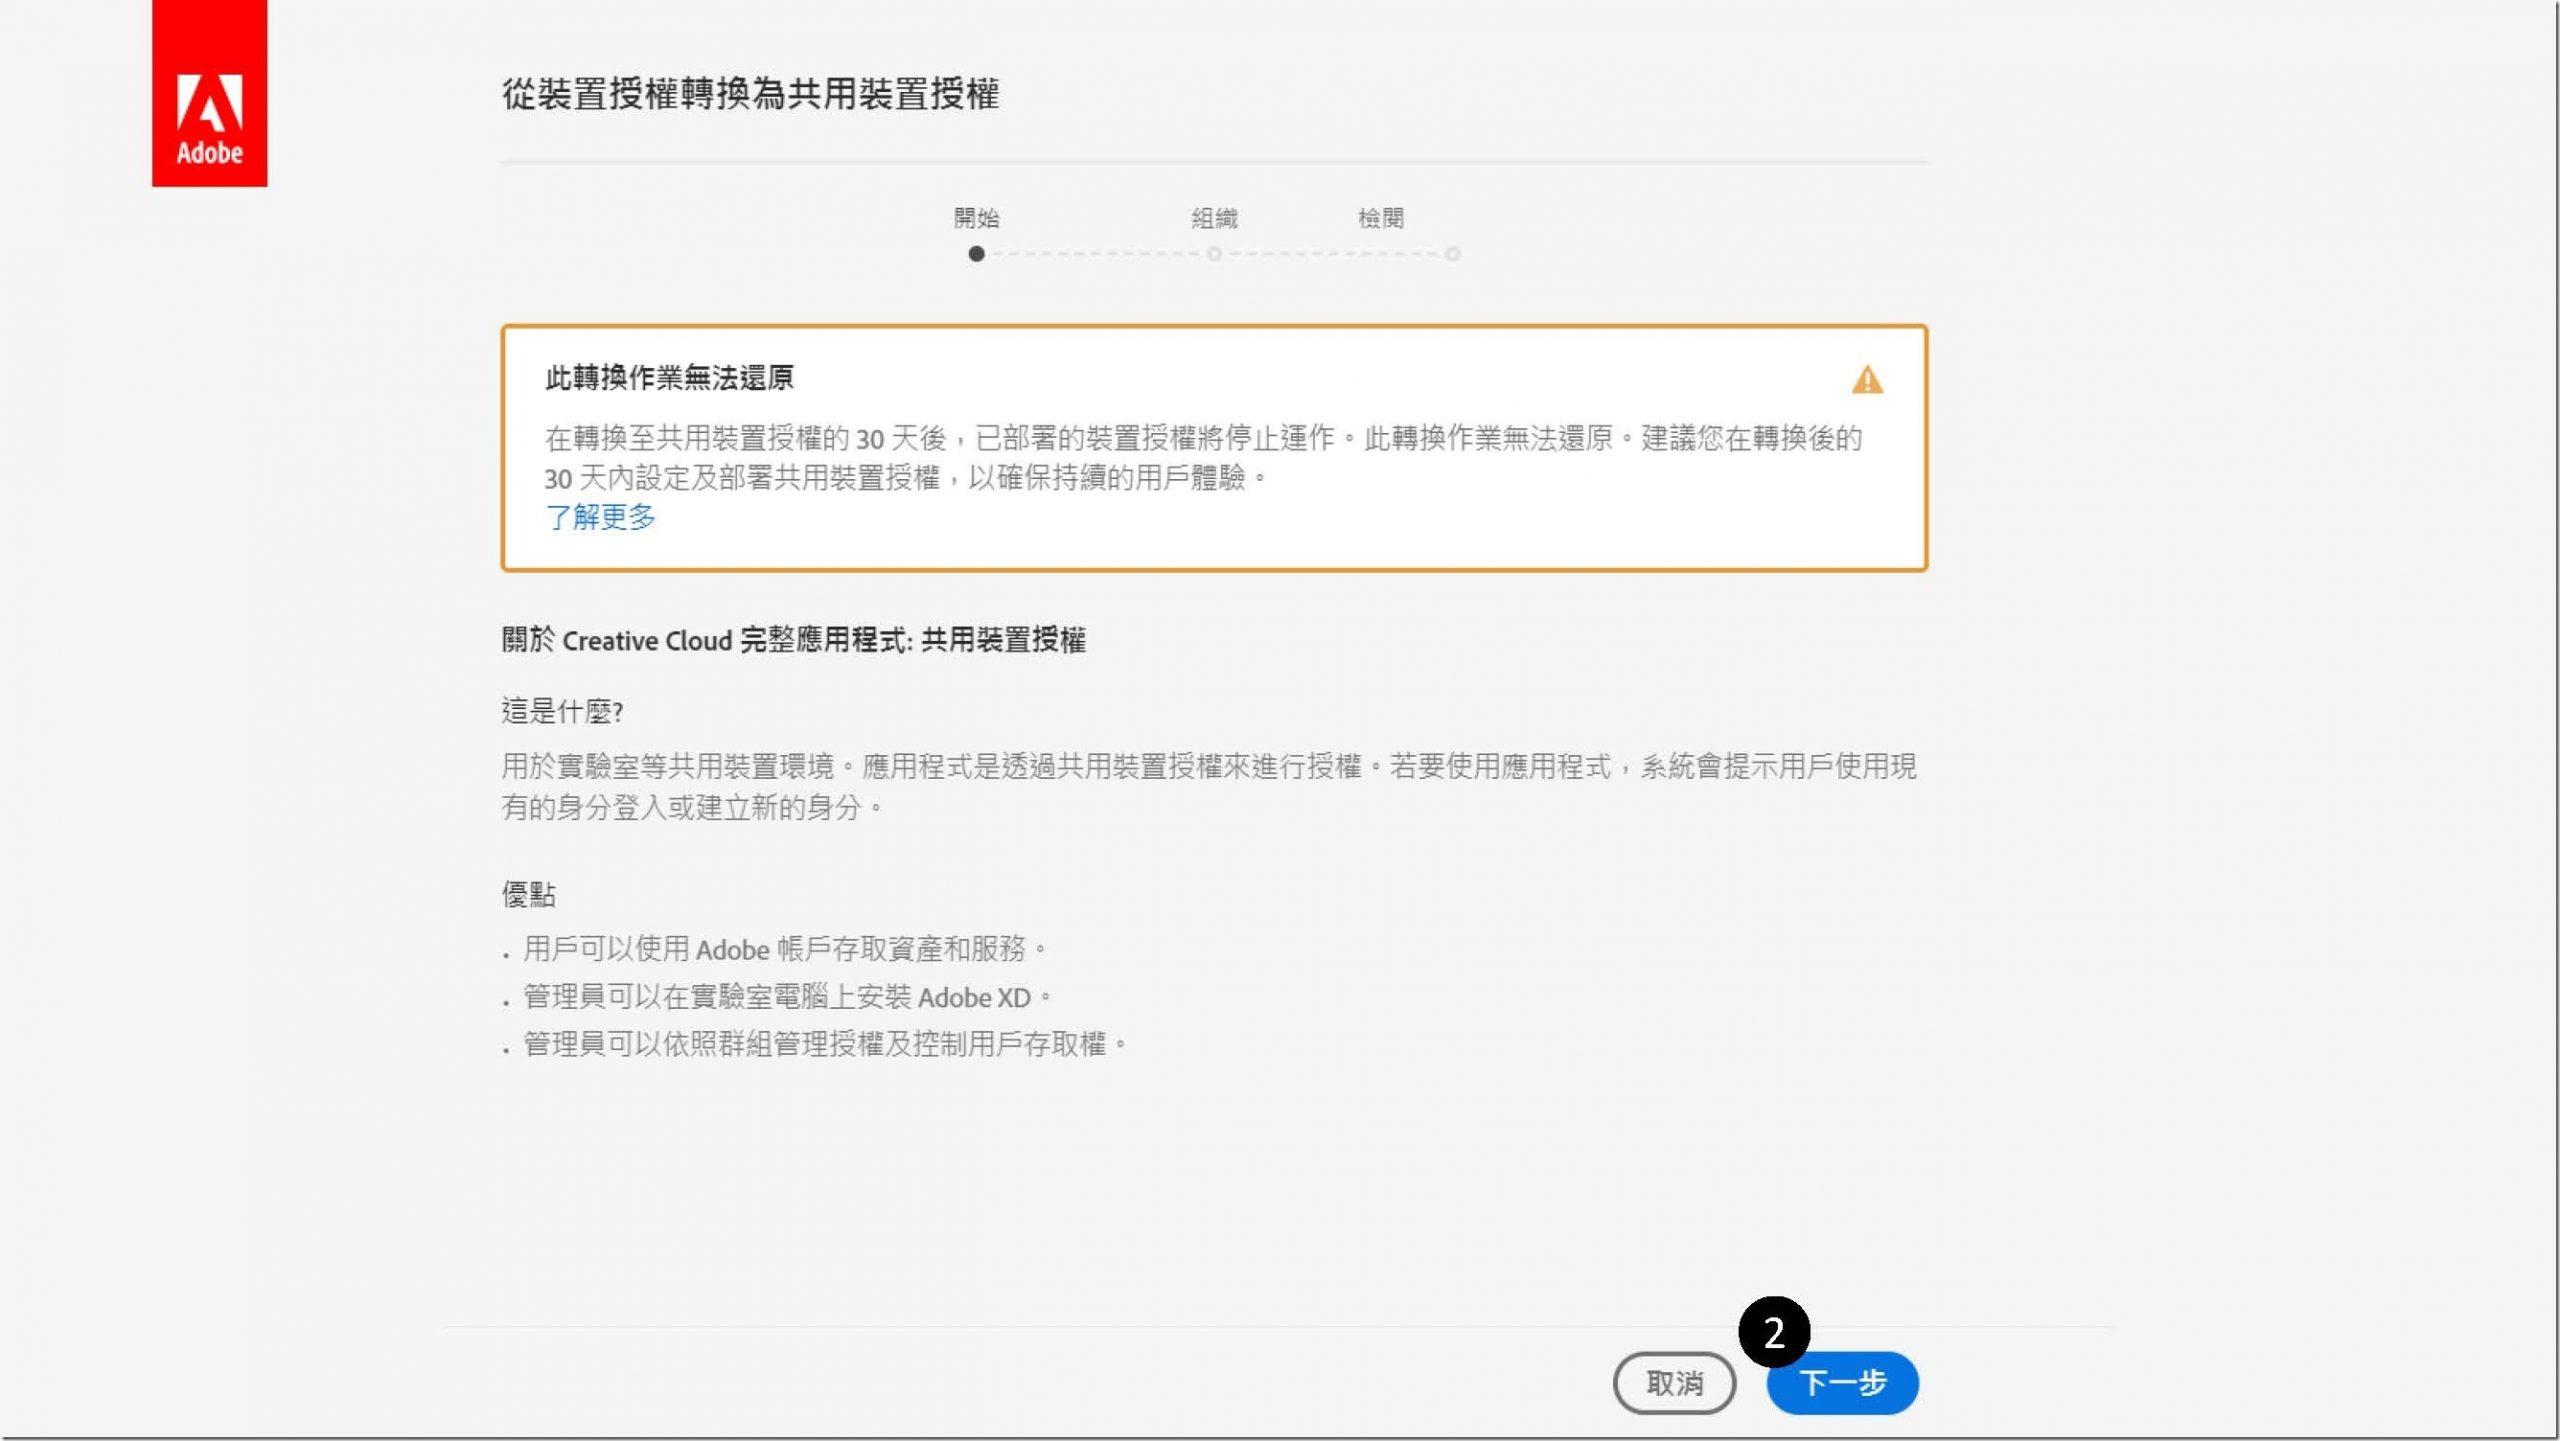 Adobe 共用裝置授權安裝指南_教育通用_頁面_05